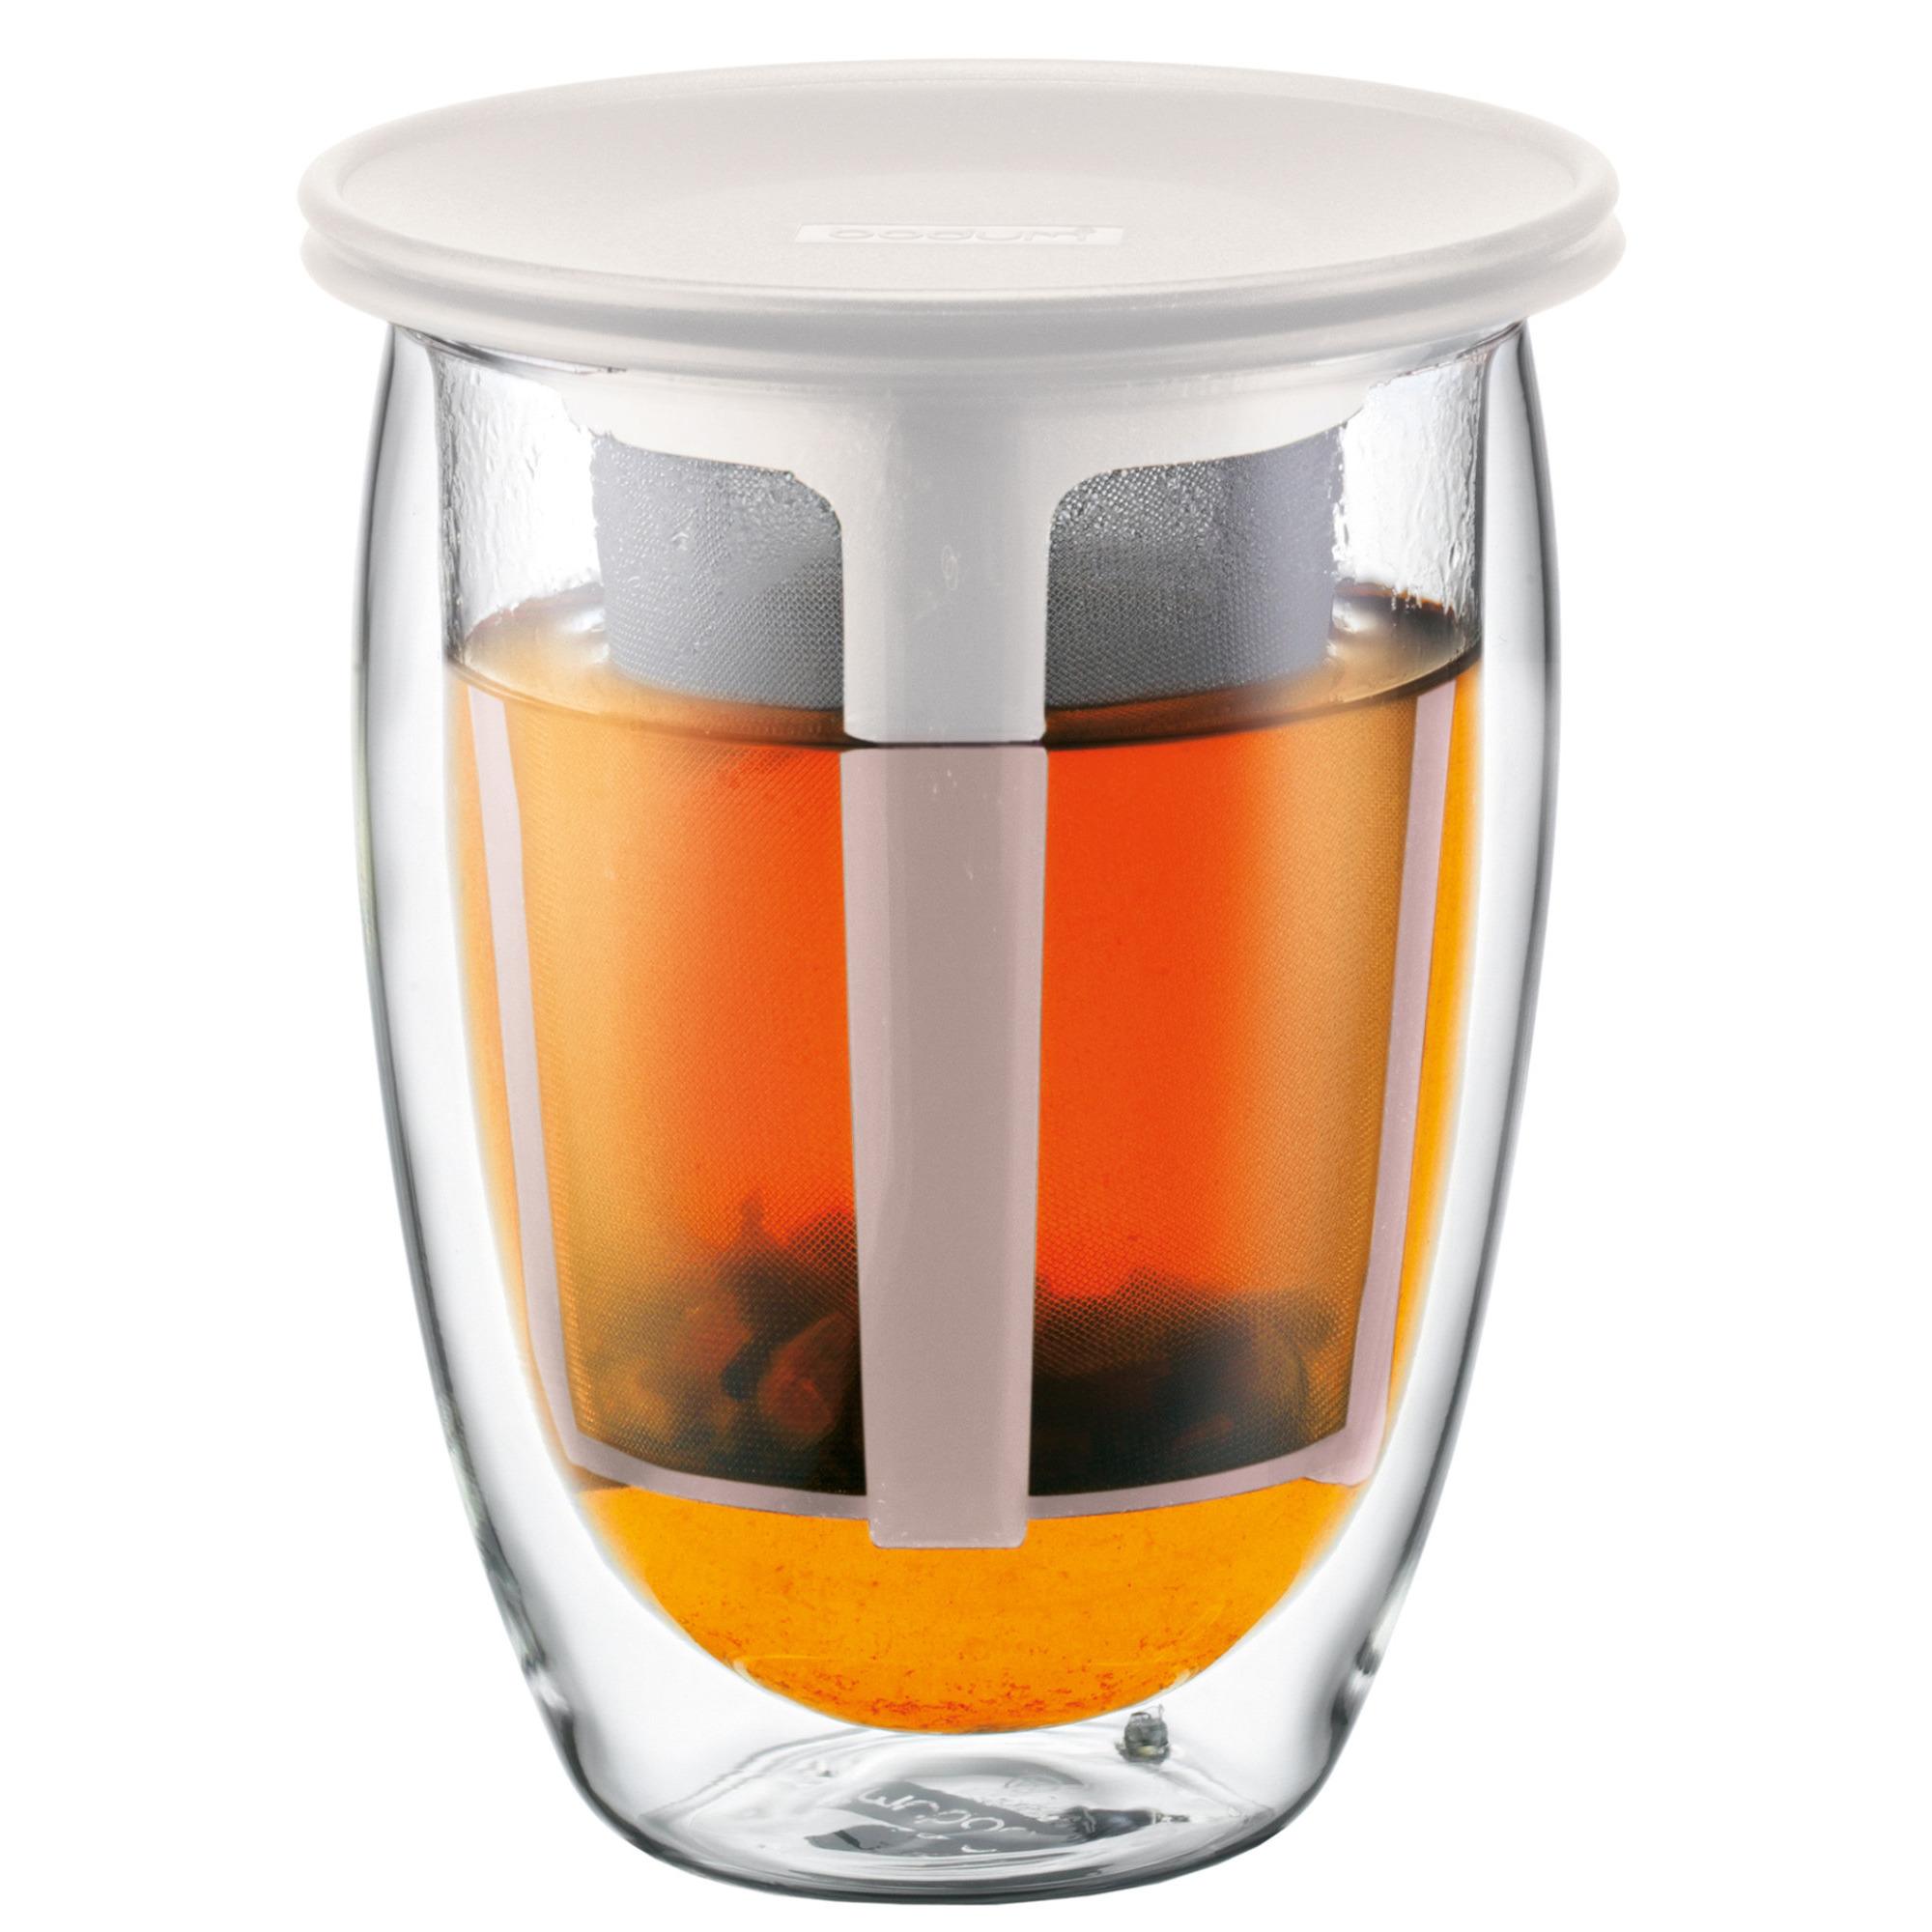 Bodum Tea for One teglas med filter 035 l Vit